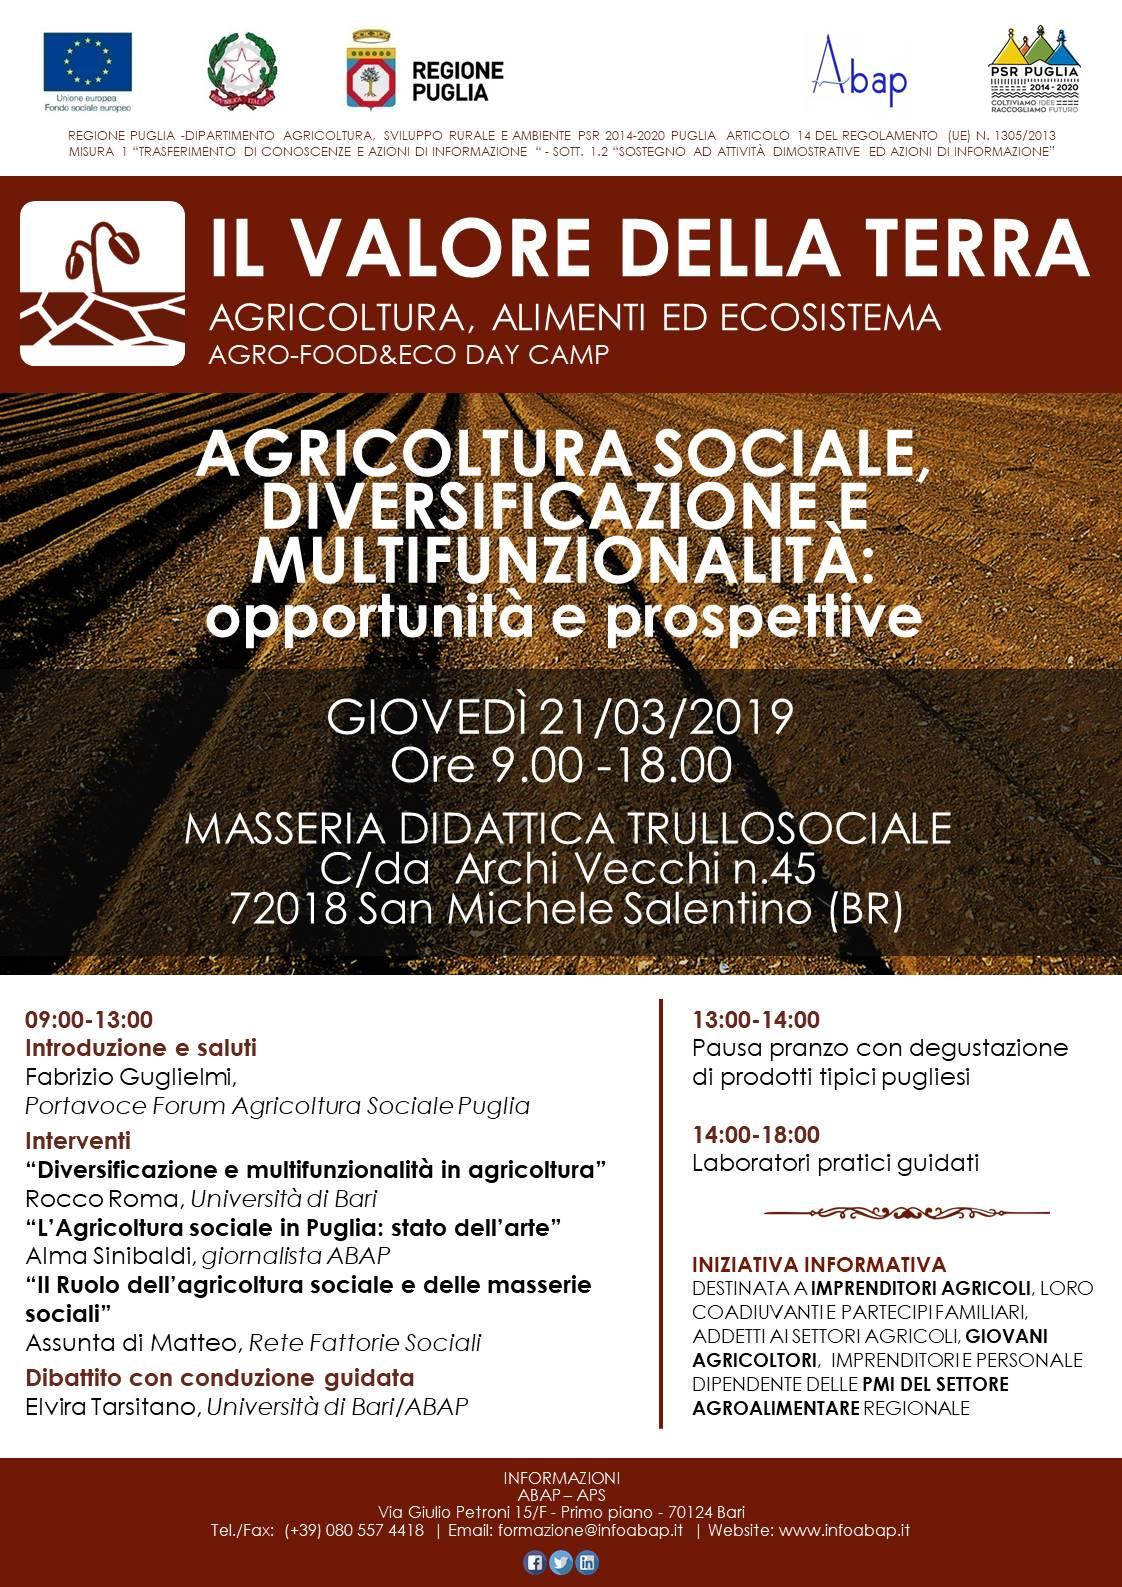 locandina_mis1-sottomisura1.2_agricoltura-sociale_21032019.1